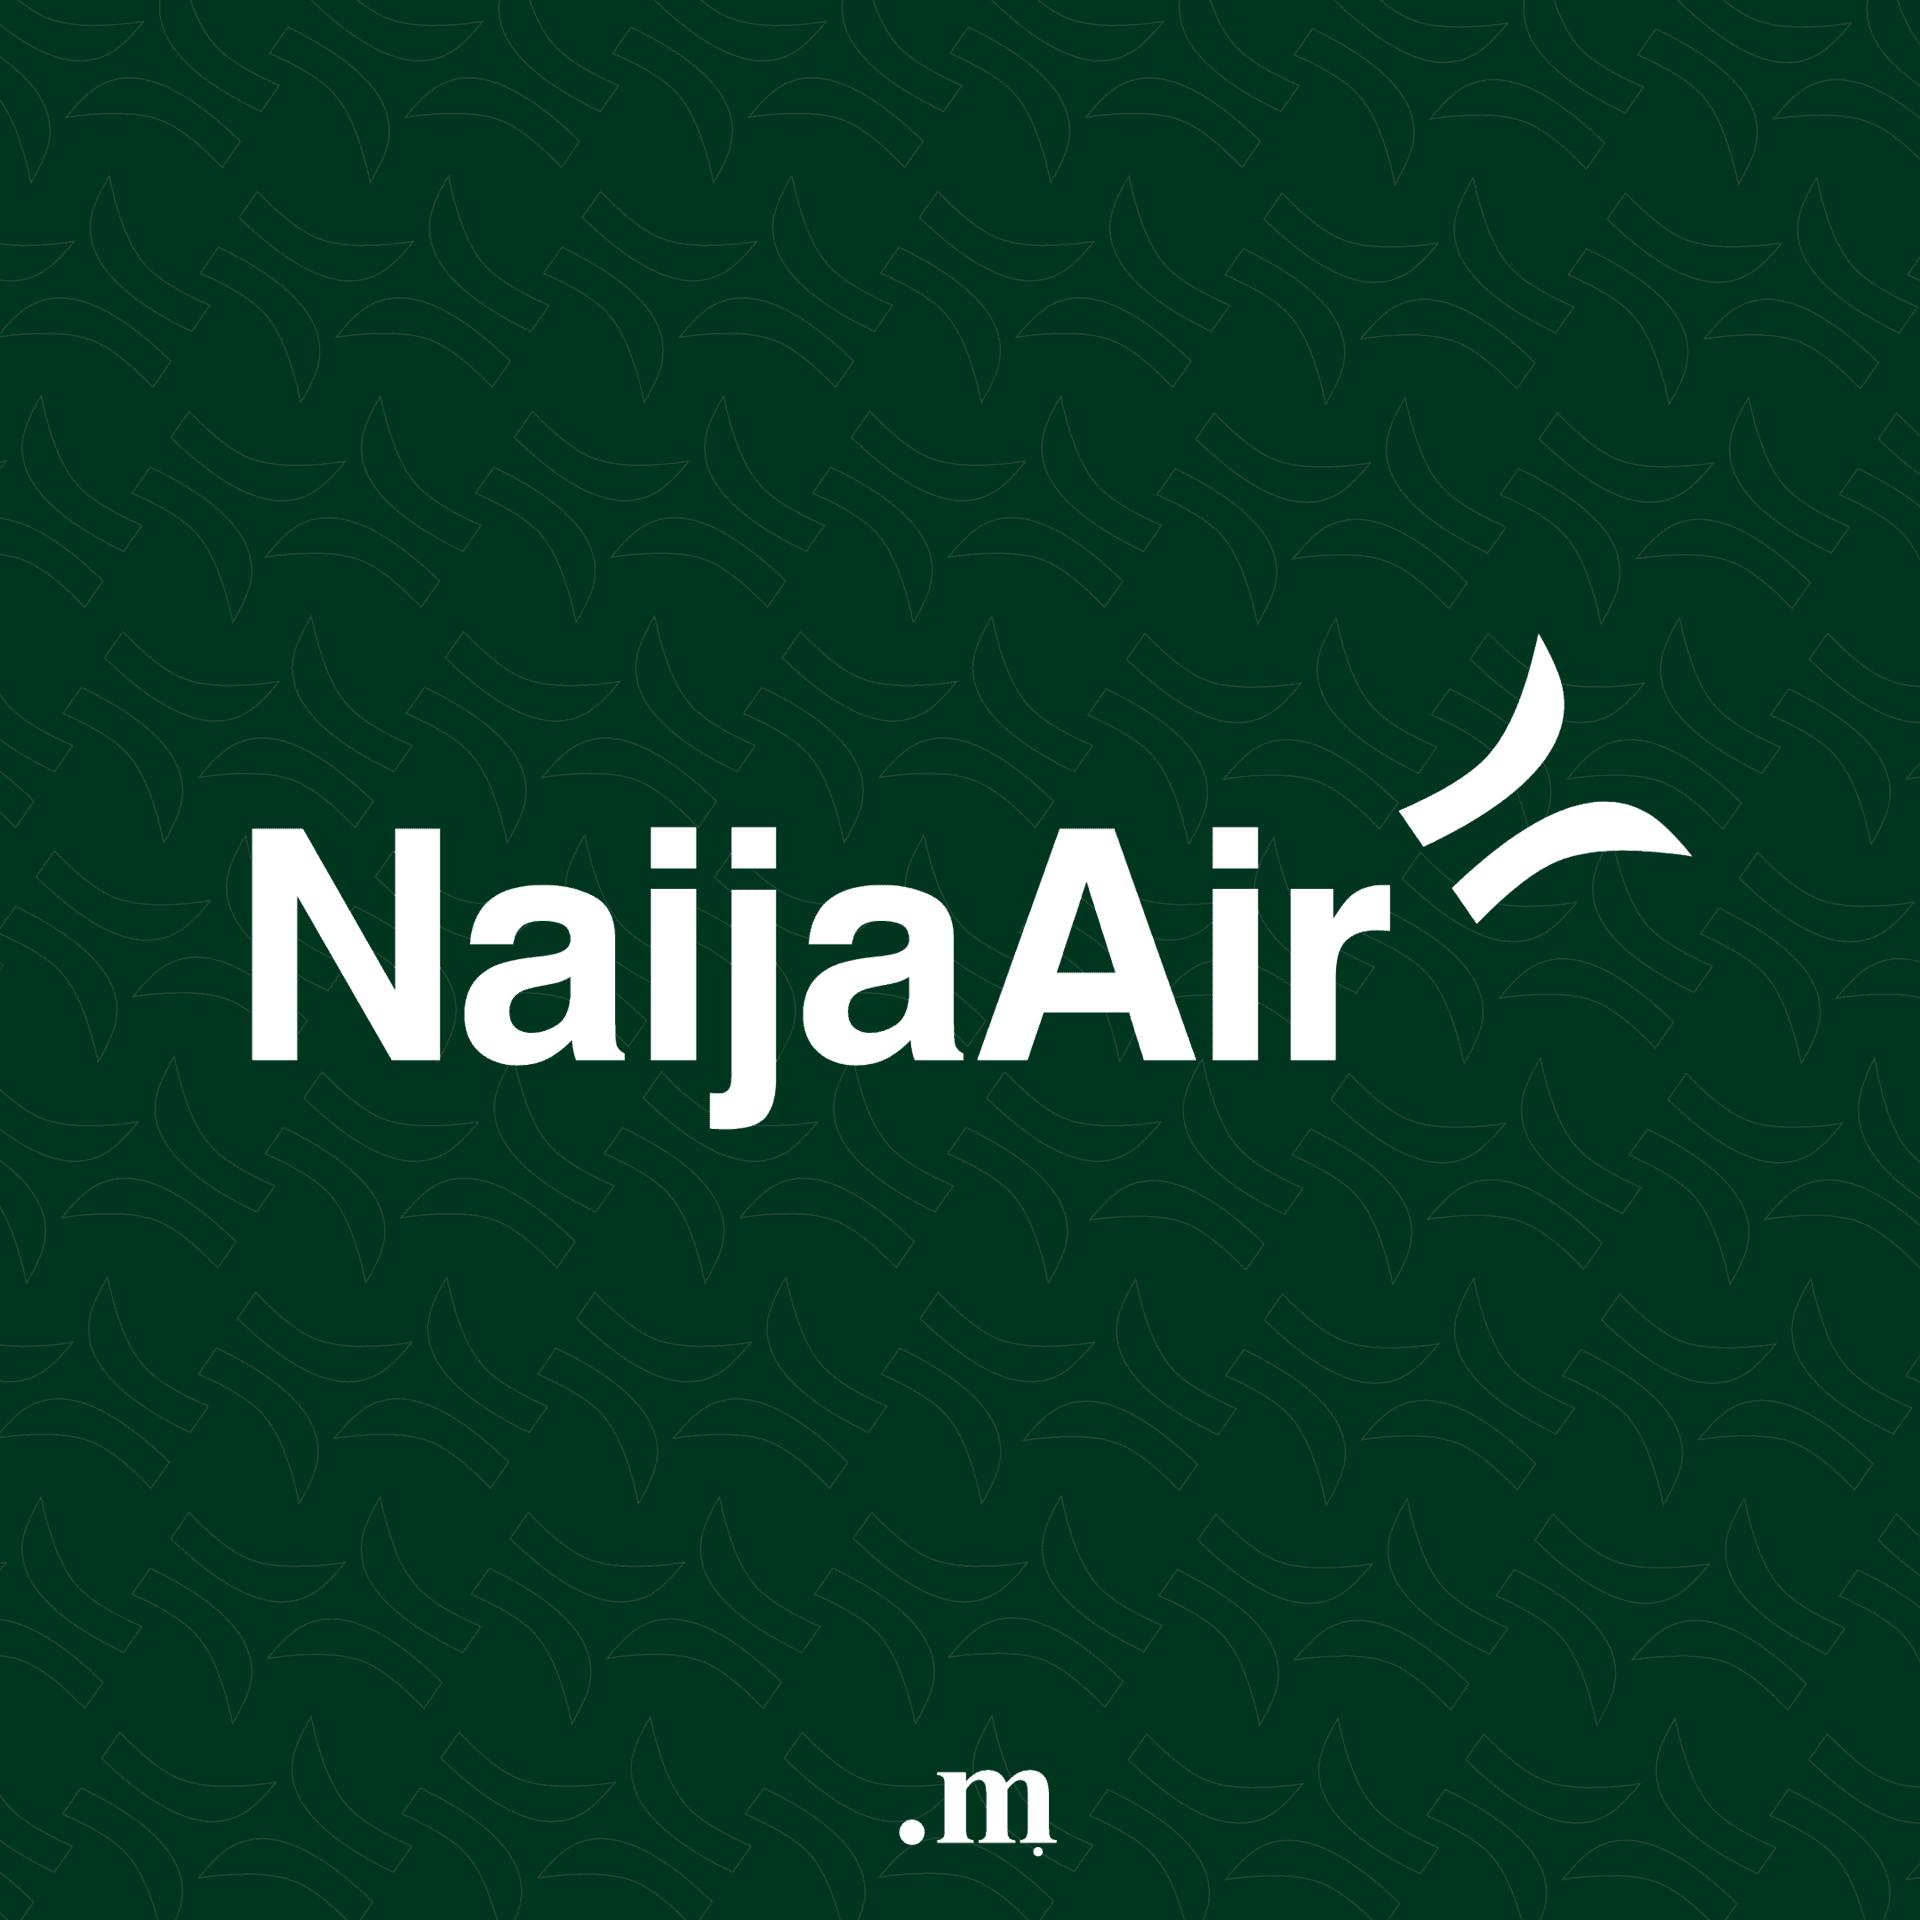 Naija Air | Nigerian Airline Visual Identity Design